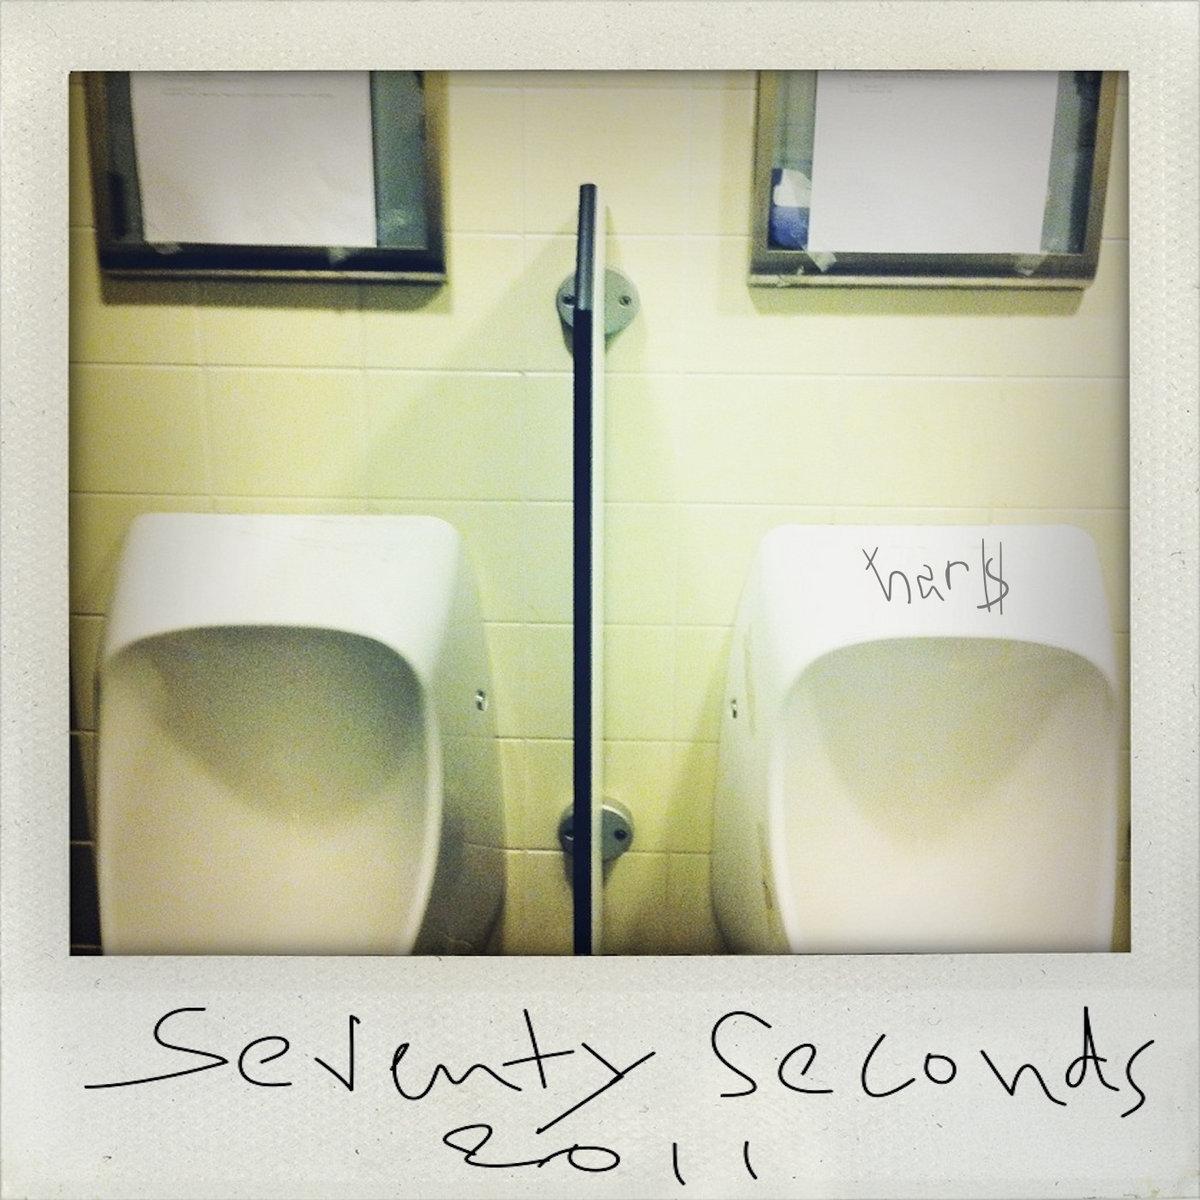 Rotan Ei Stoel.Seventy Seconds Soundblog